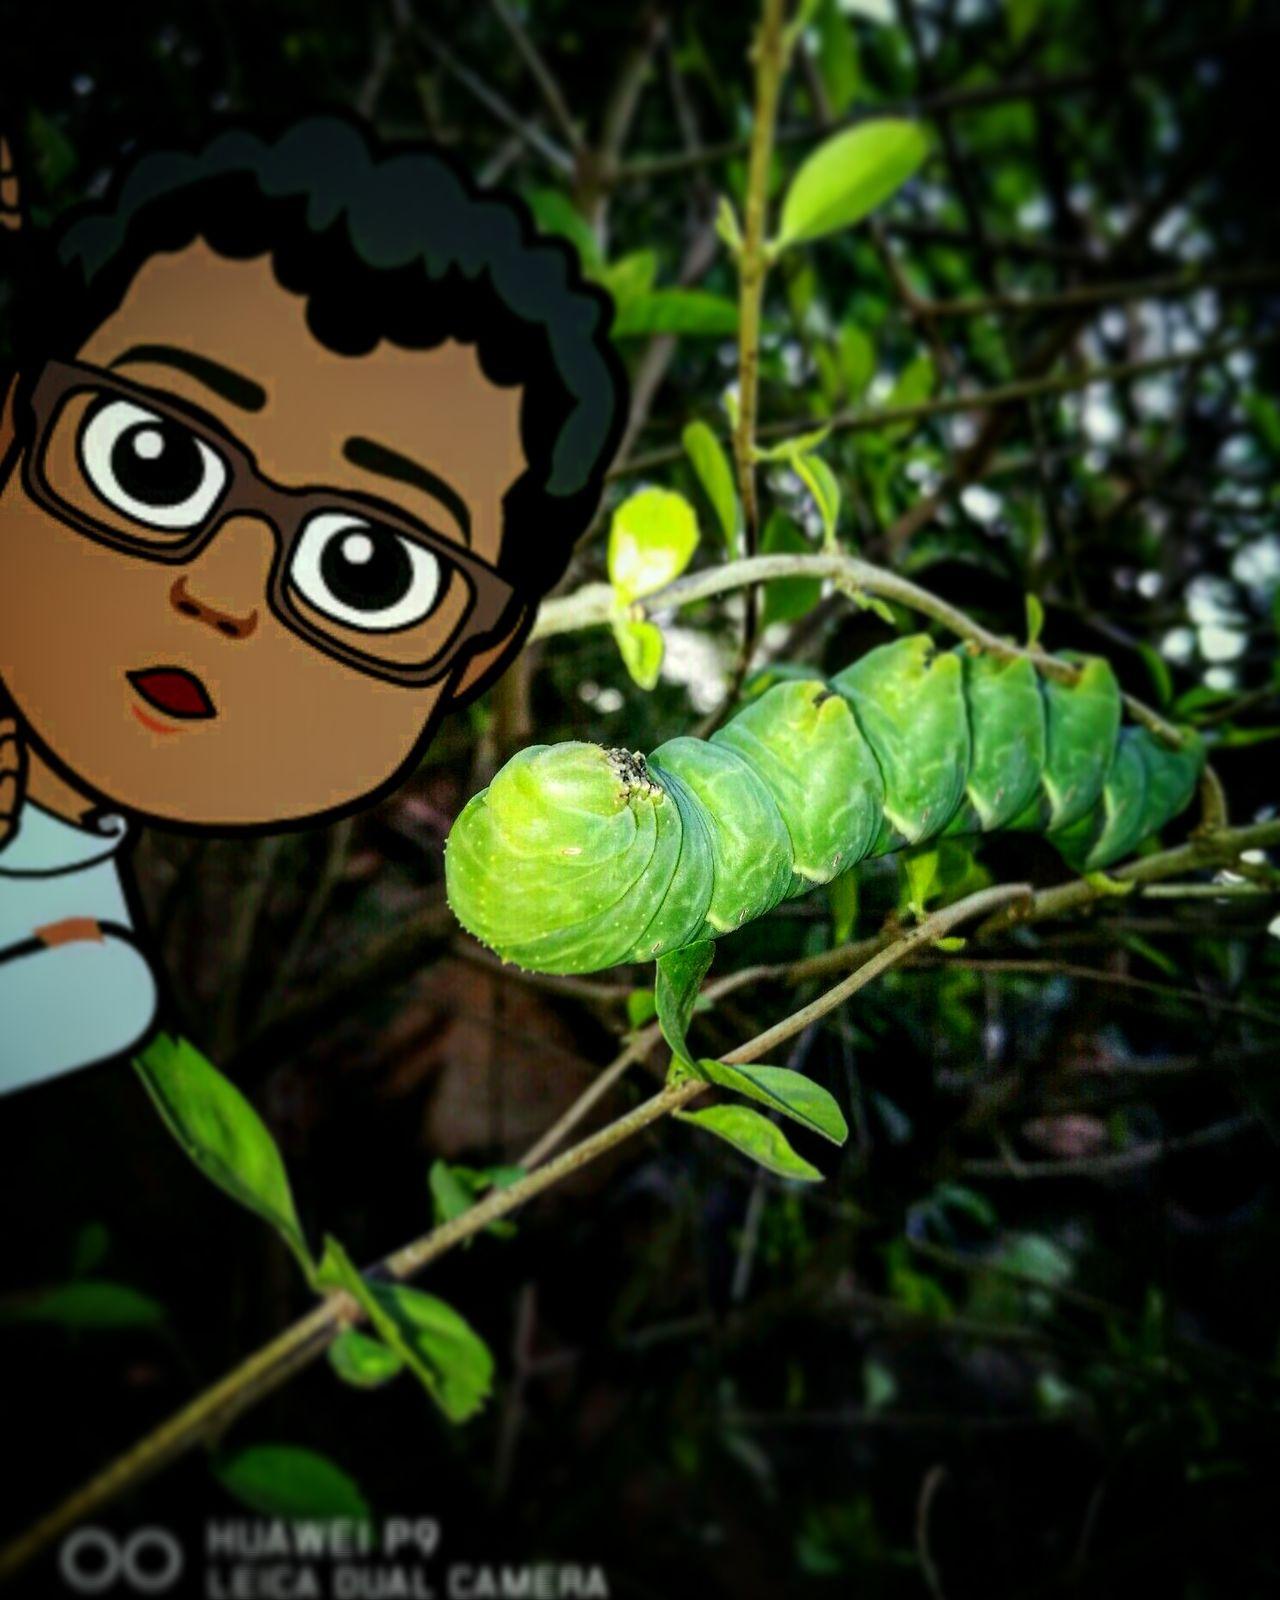 Insect Nature Pura Vida ✌ Costa Rica Costaricacool Costaricanatural Nature